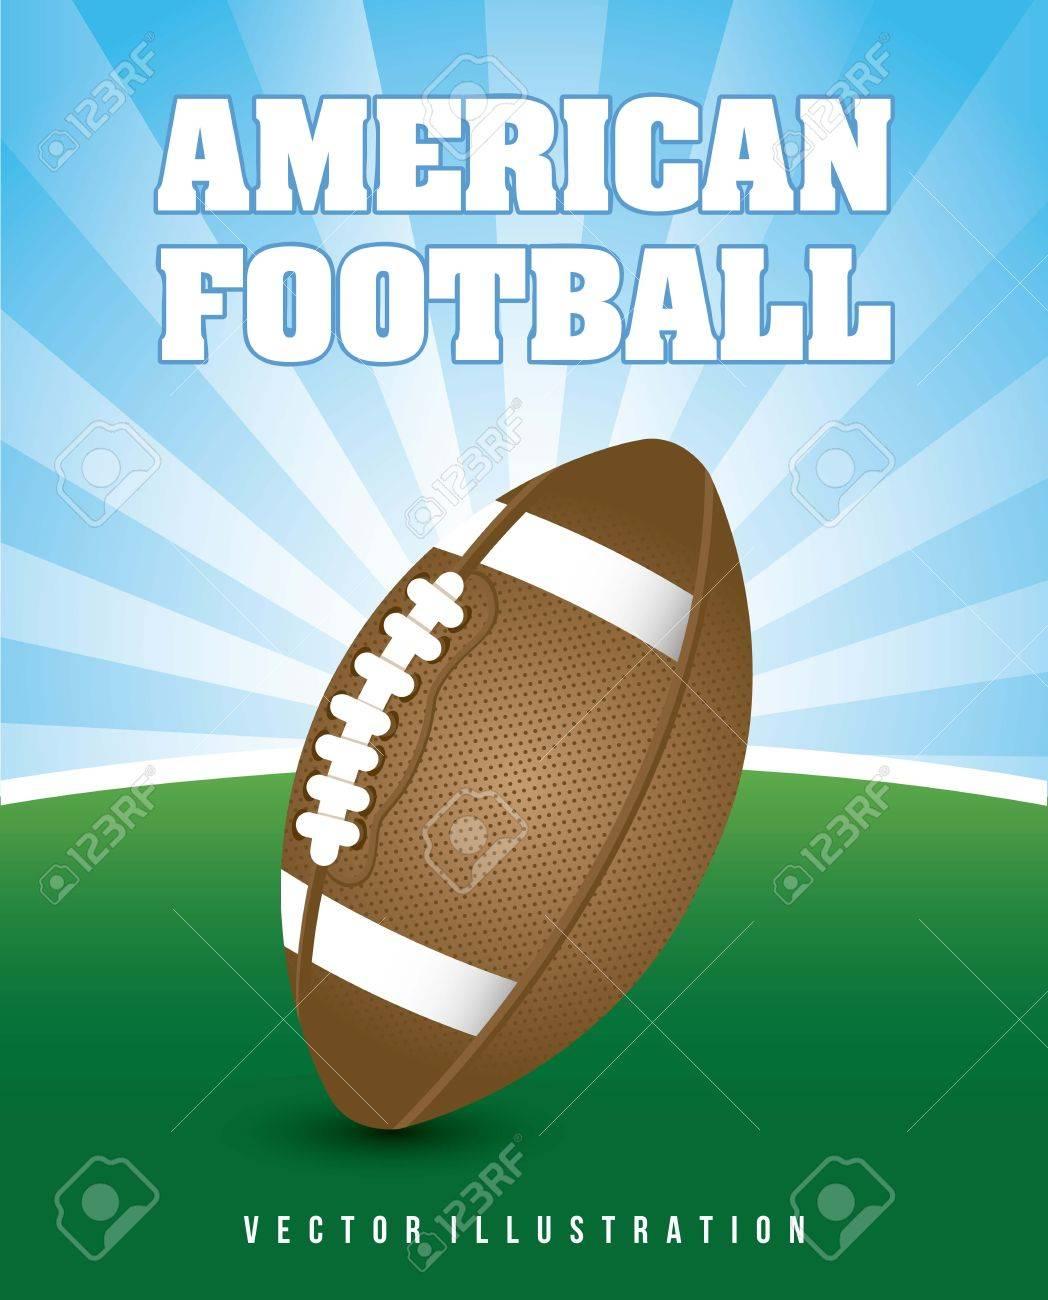 american football over landscape background. vector illustration Stock Vector - 17349525